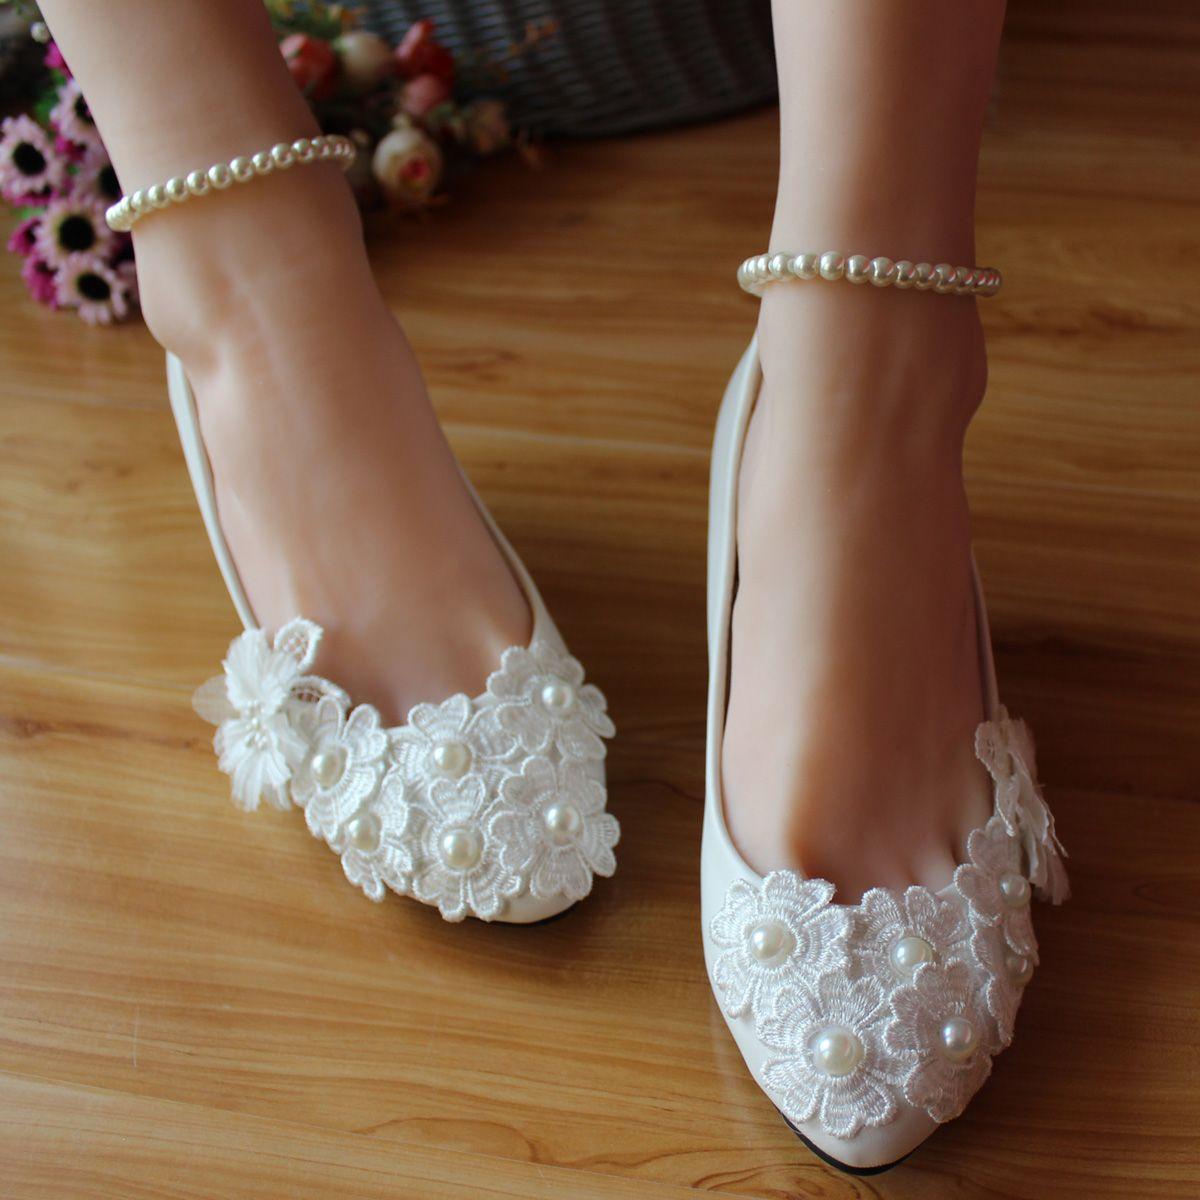 3cm Heel Pearl Bandage Wedding Shoes The Bride Bridal Womens Pumps Low